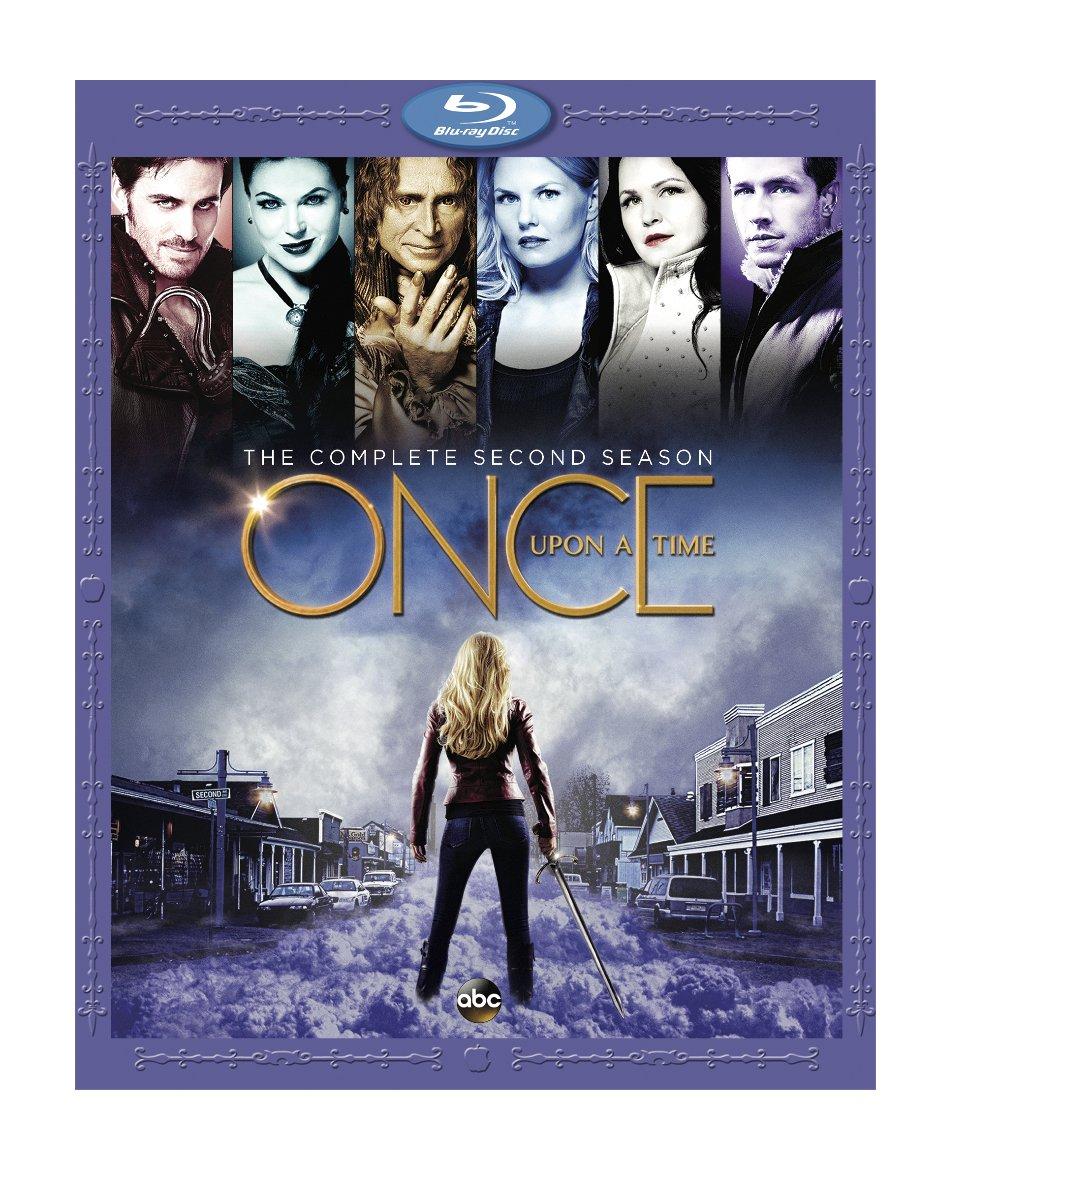 Once Upon A Time: The Complete Second Season (5 Blu-Ray) [Edizione: Stati Uniti] [USA] [Blu-ray]